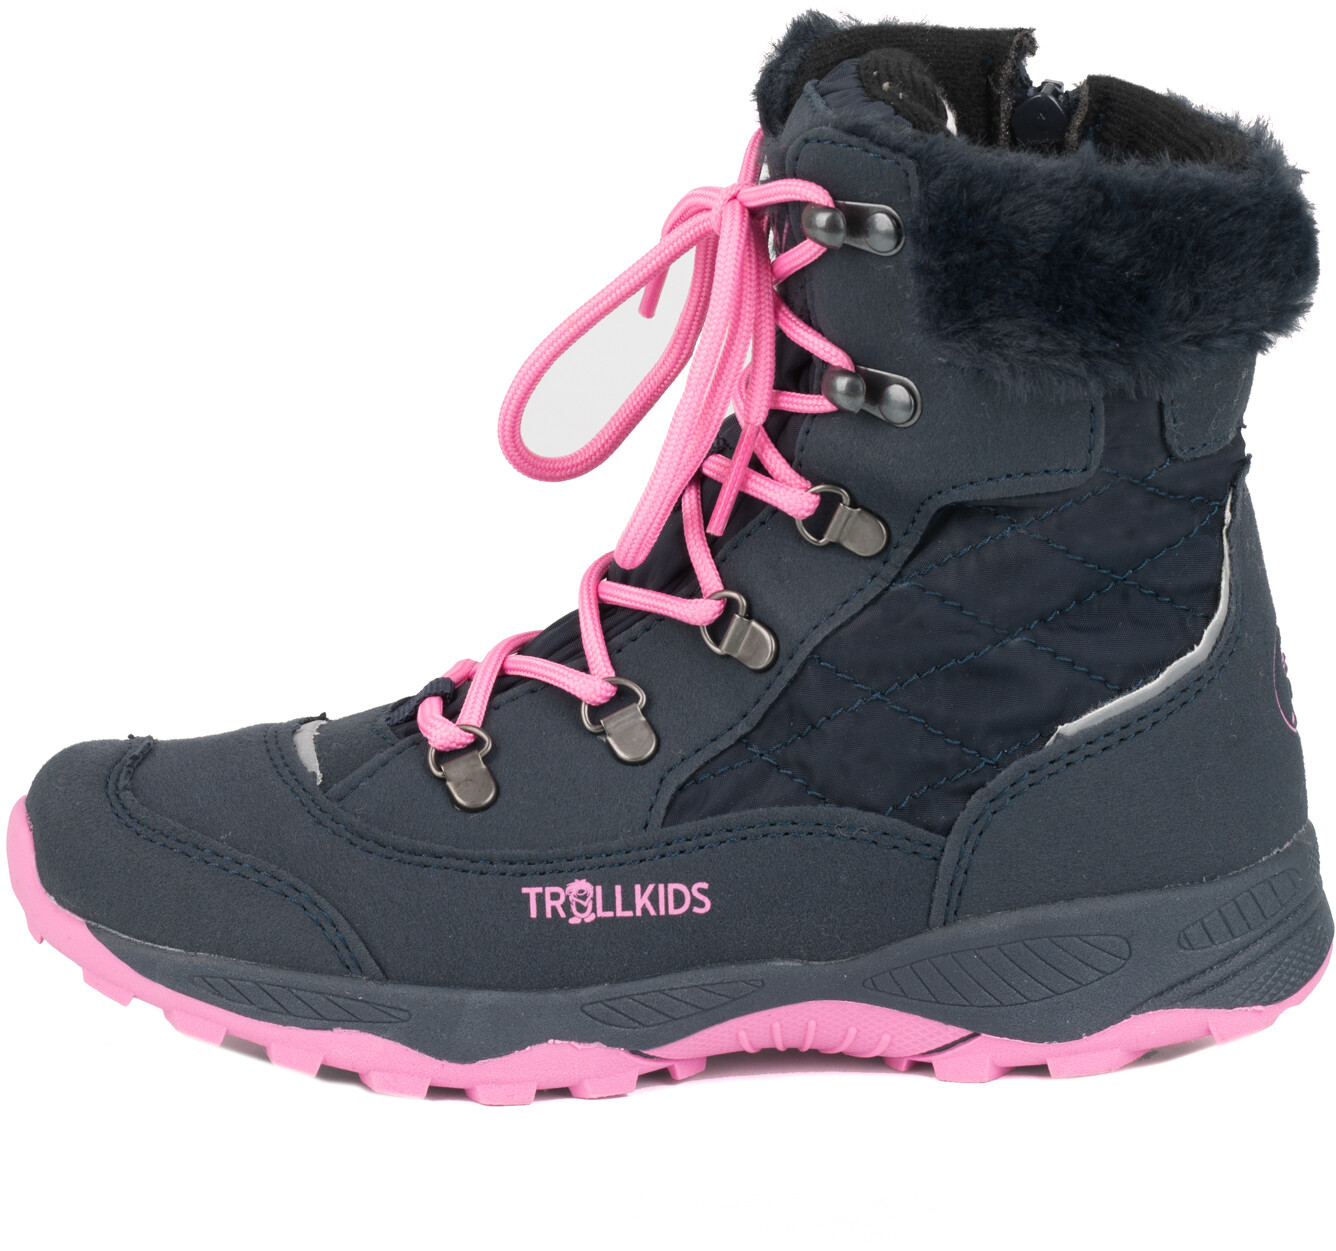 TROLLKIDS Hemsedal Winter Boots Meisjes, navymagenta